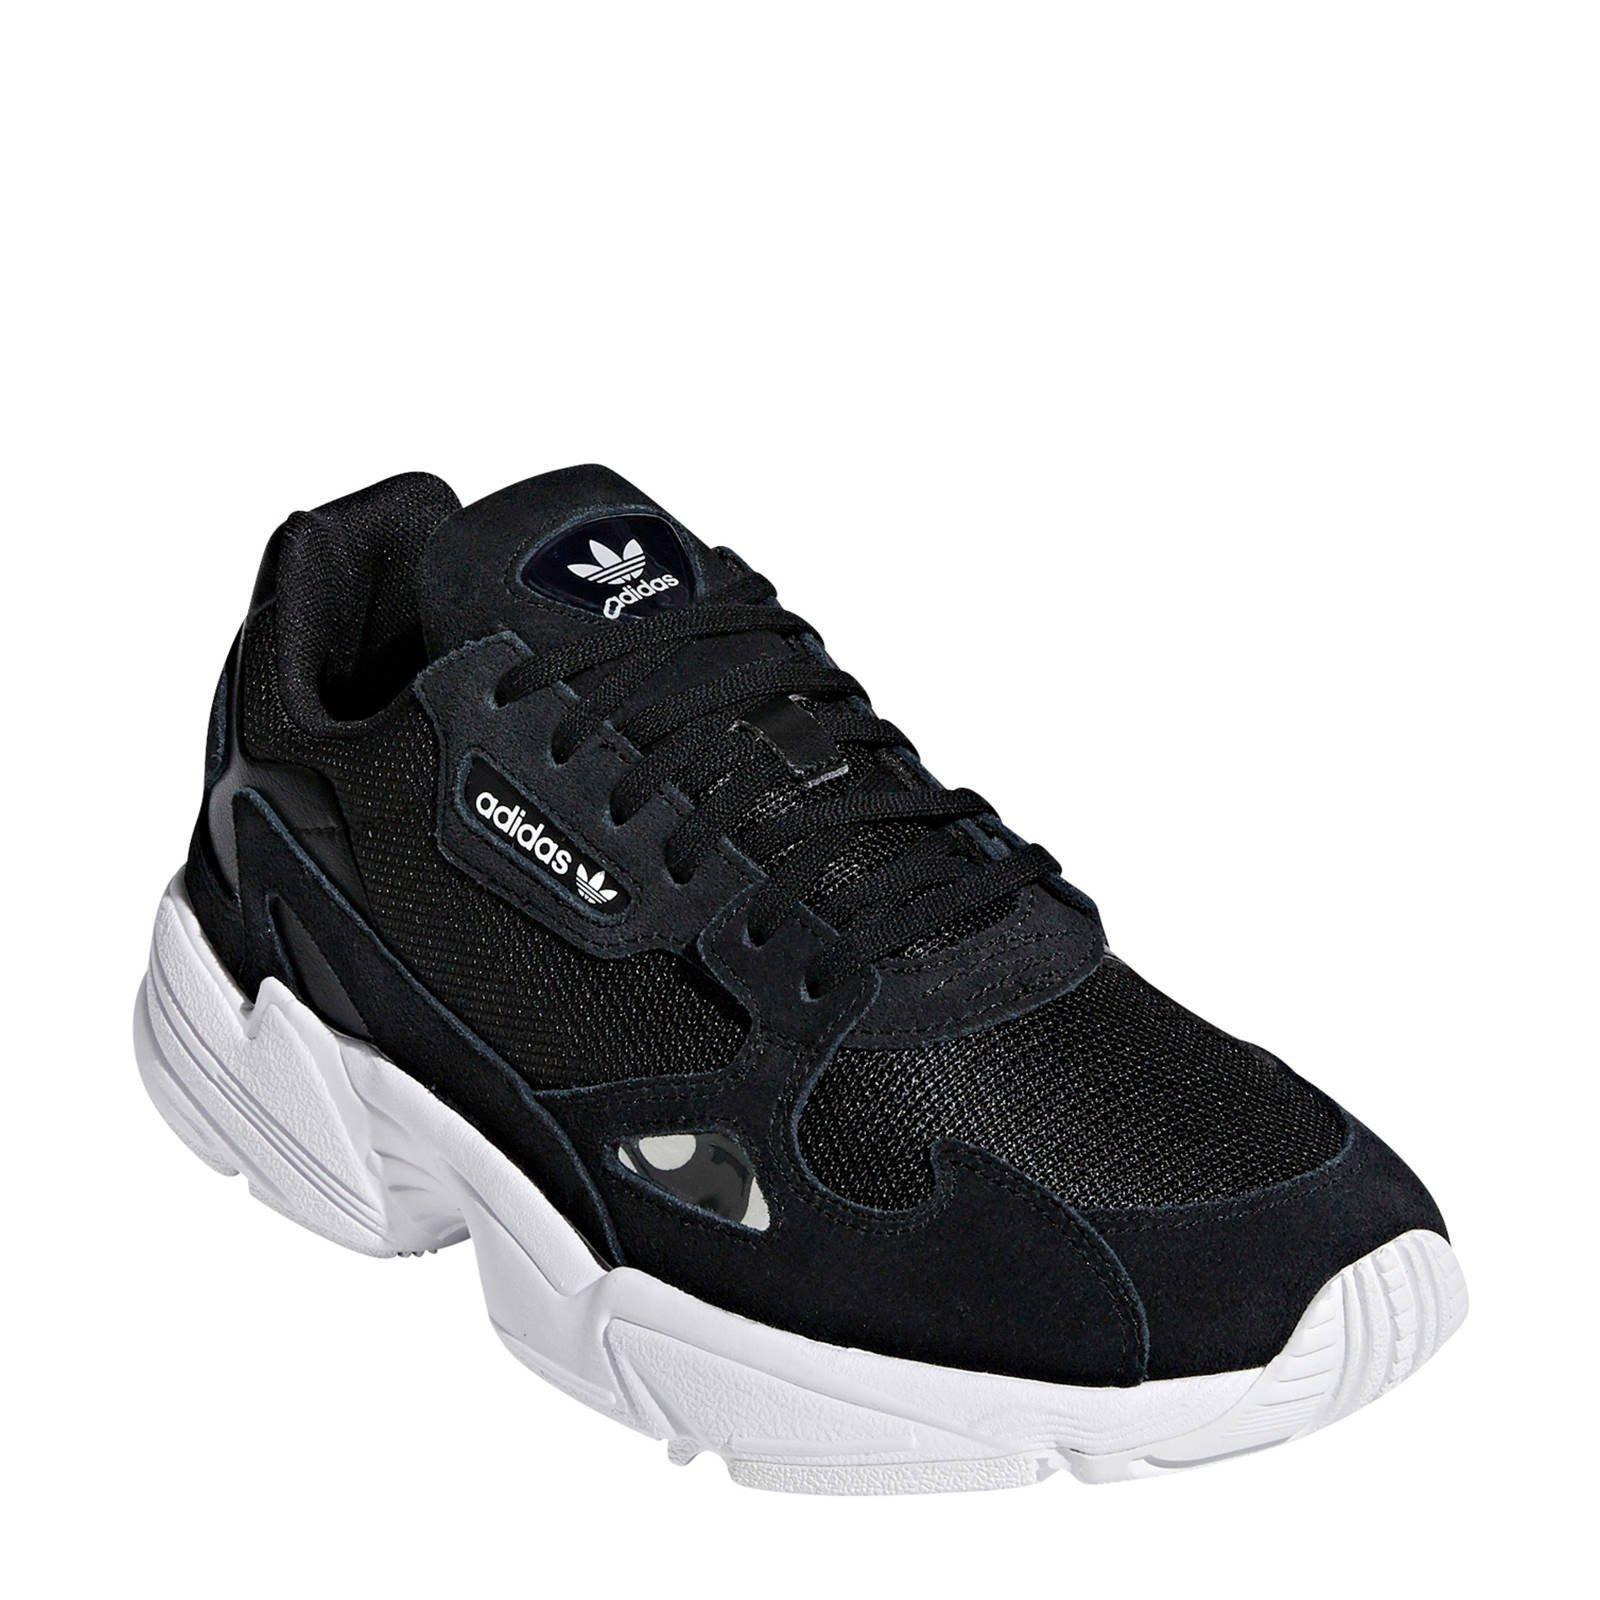 adidas Originals adidas Originals Falcon sneakers zwartwit | wehkamp | wehkamp